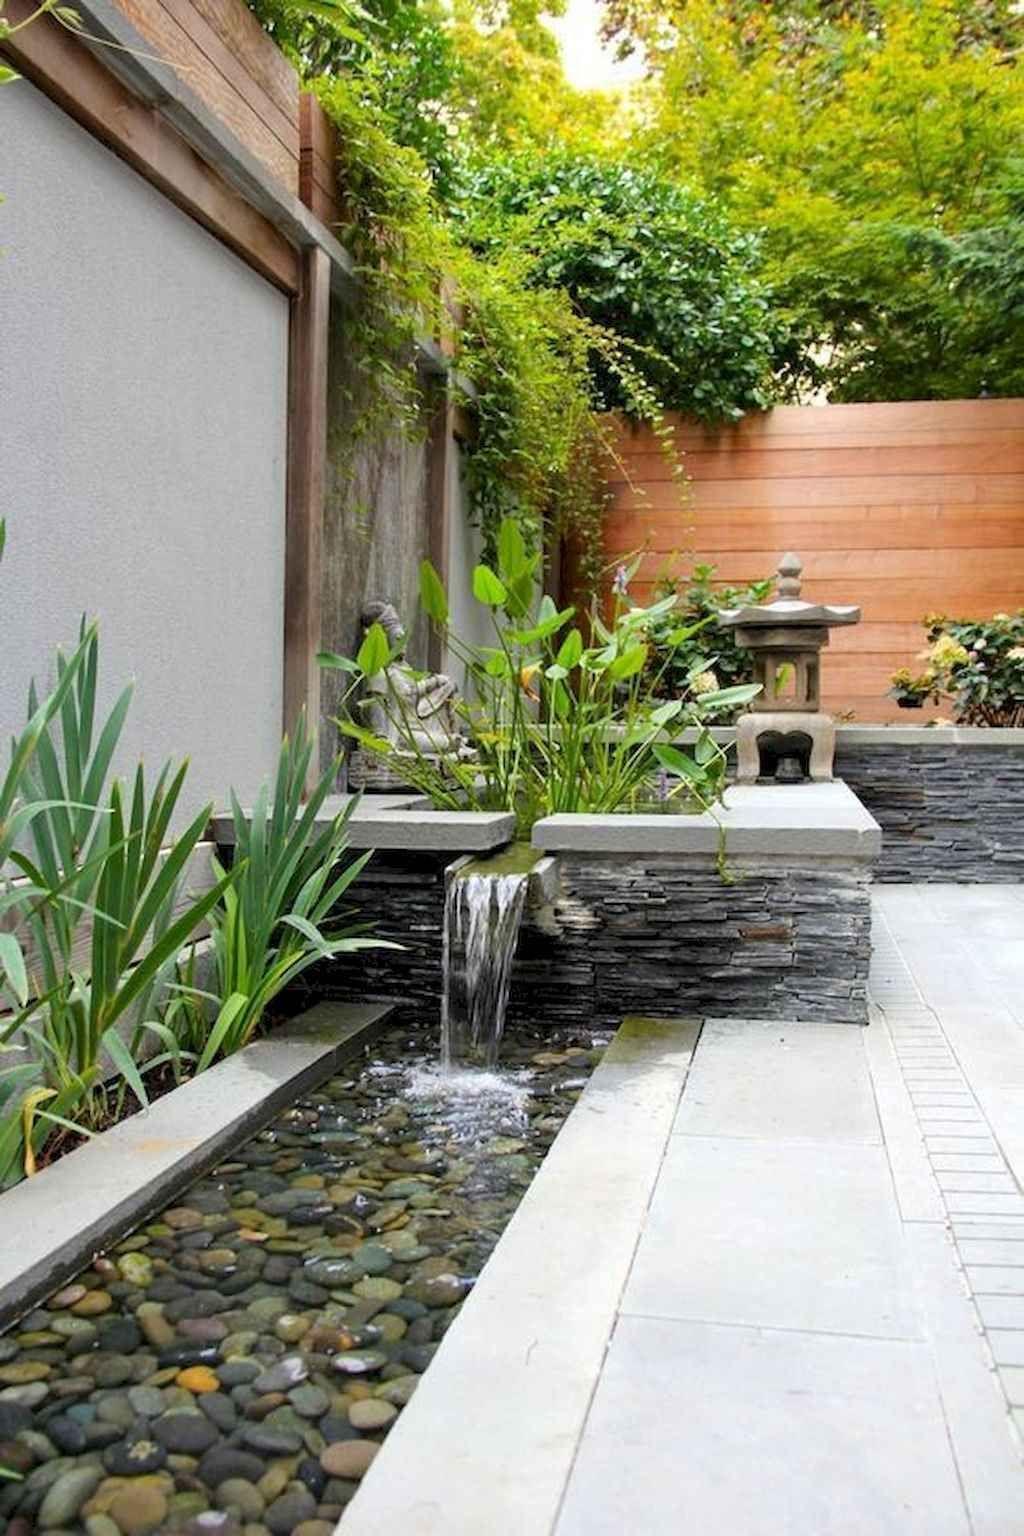 Cool 45 Best Modern Side Yard Landscaping Ideas For Garden Decor Design Source Link Decortut Water Features In The Garden Zen Garden Design Mini Zen Garden Modern backyard water feature ideas